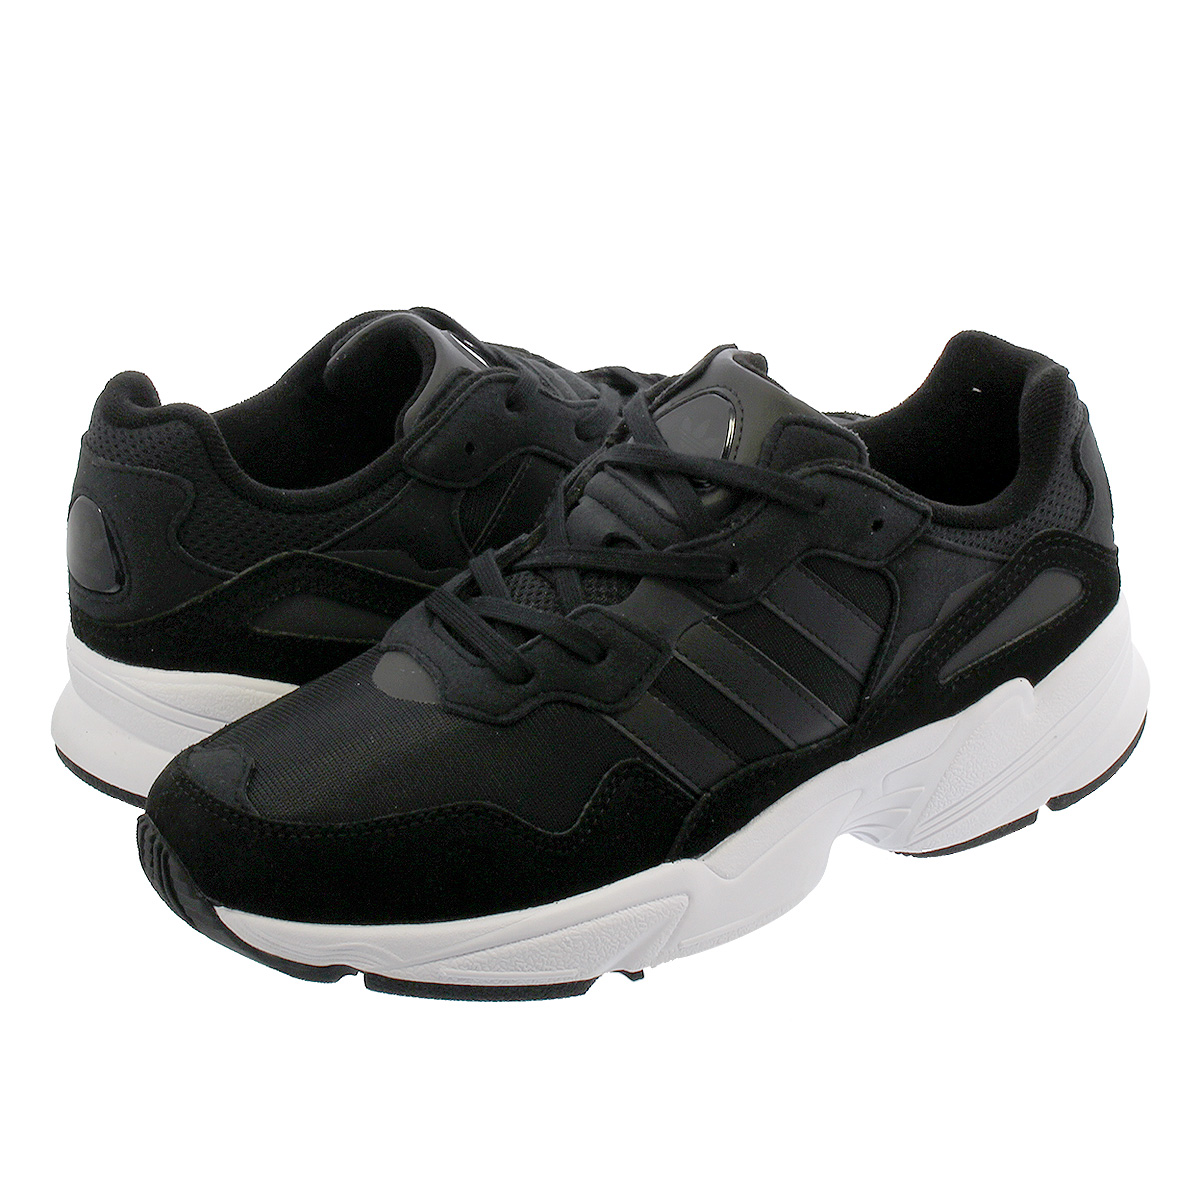 adidas YUNG-96 【adidas Originals】 アディダス ヤング 96 CORE BLACK/CORE BLACK/CRYSTAL WHITE ee3681